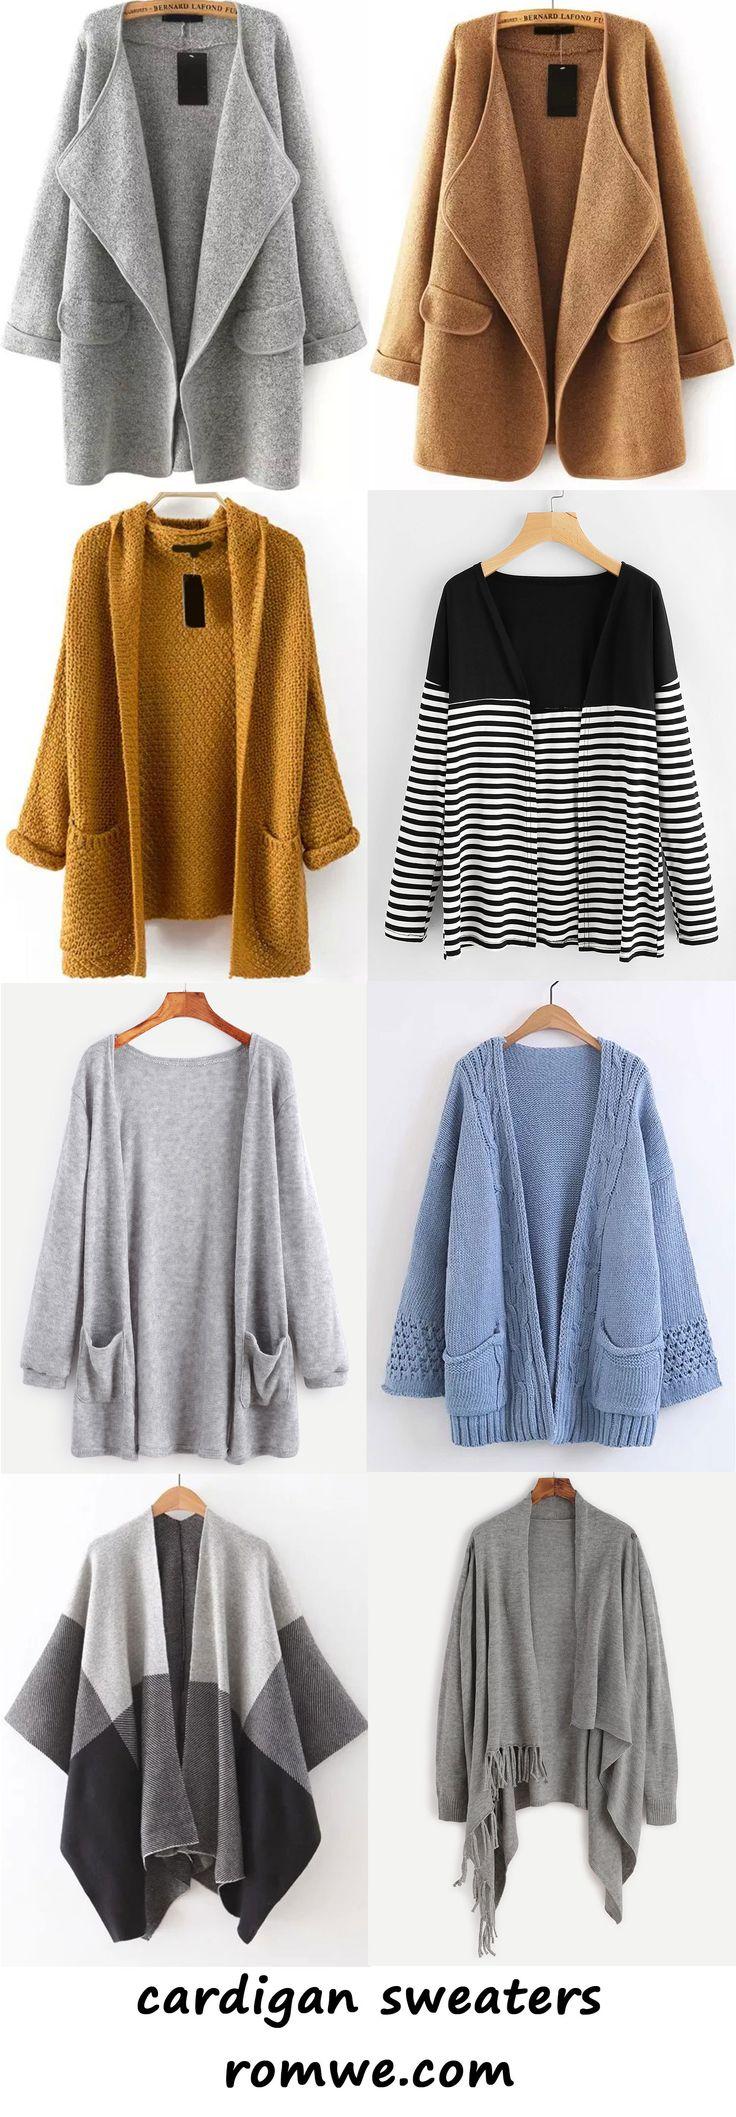 cardigan sweaters 2017 - romwe.com